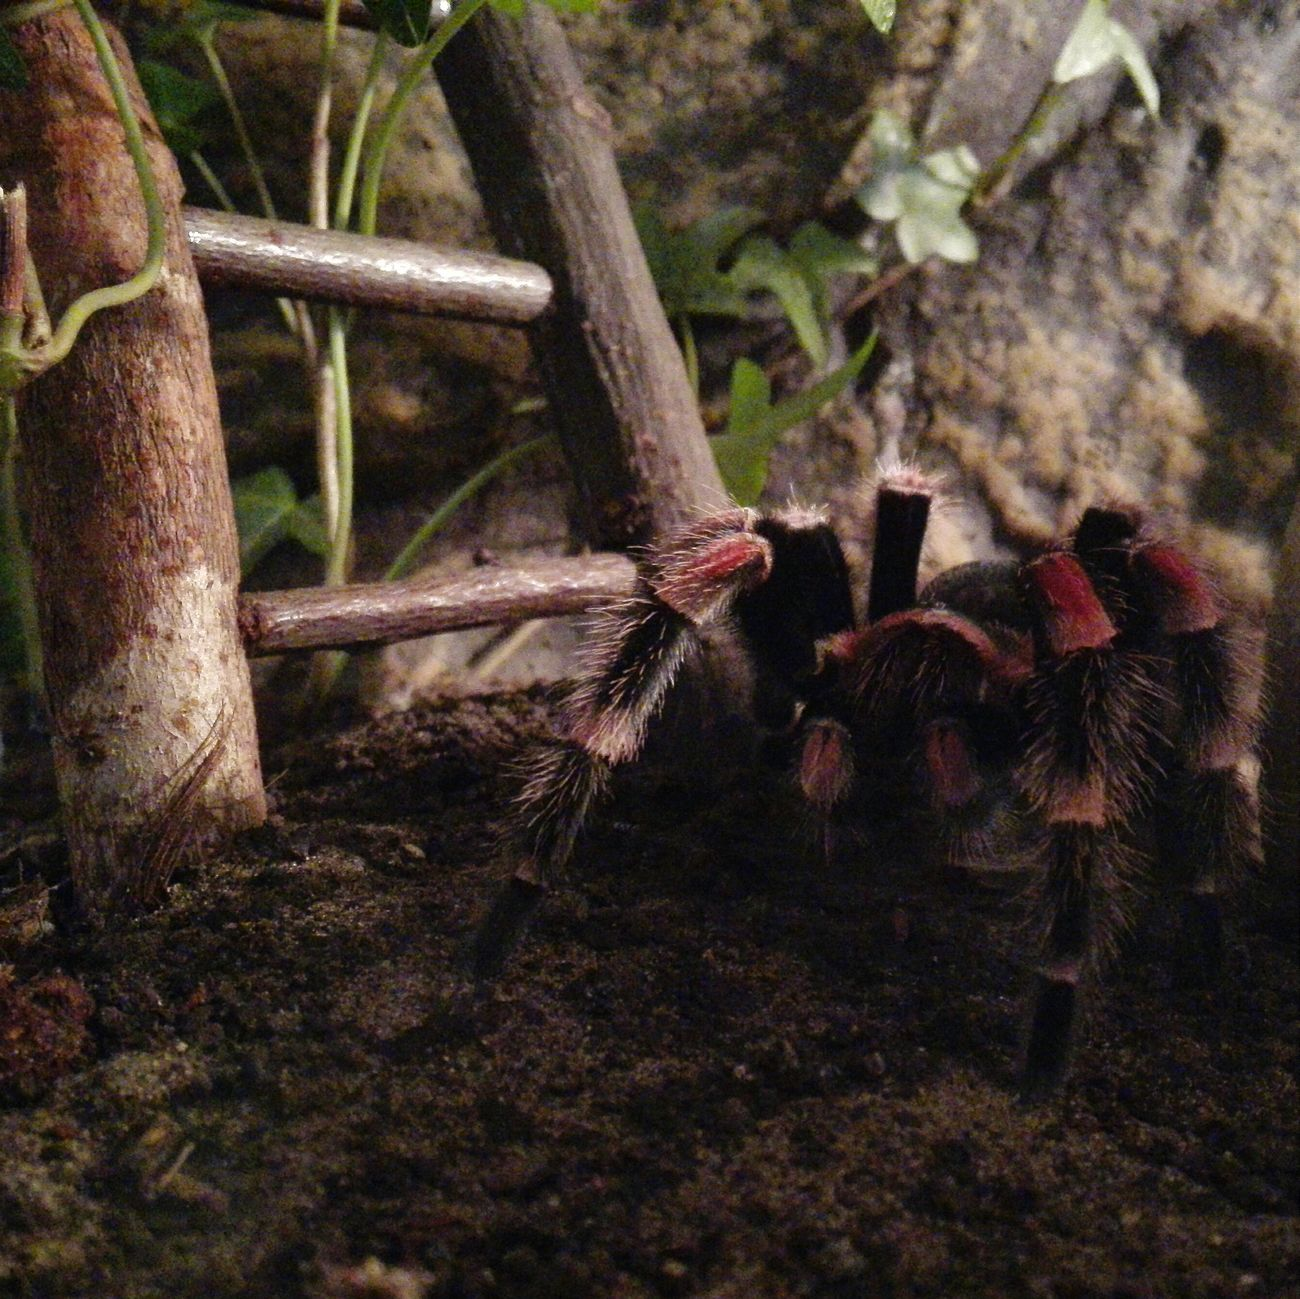 Spinne Marie - Brachypelma Smithi Brachypelma Vogelspinne Tarantula